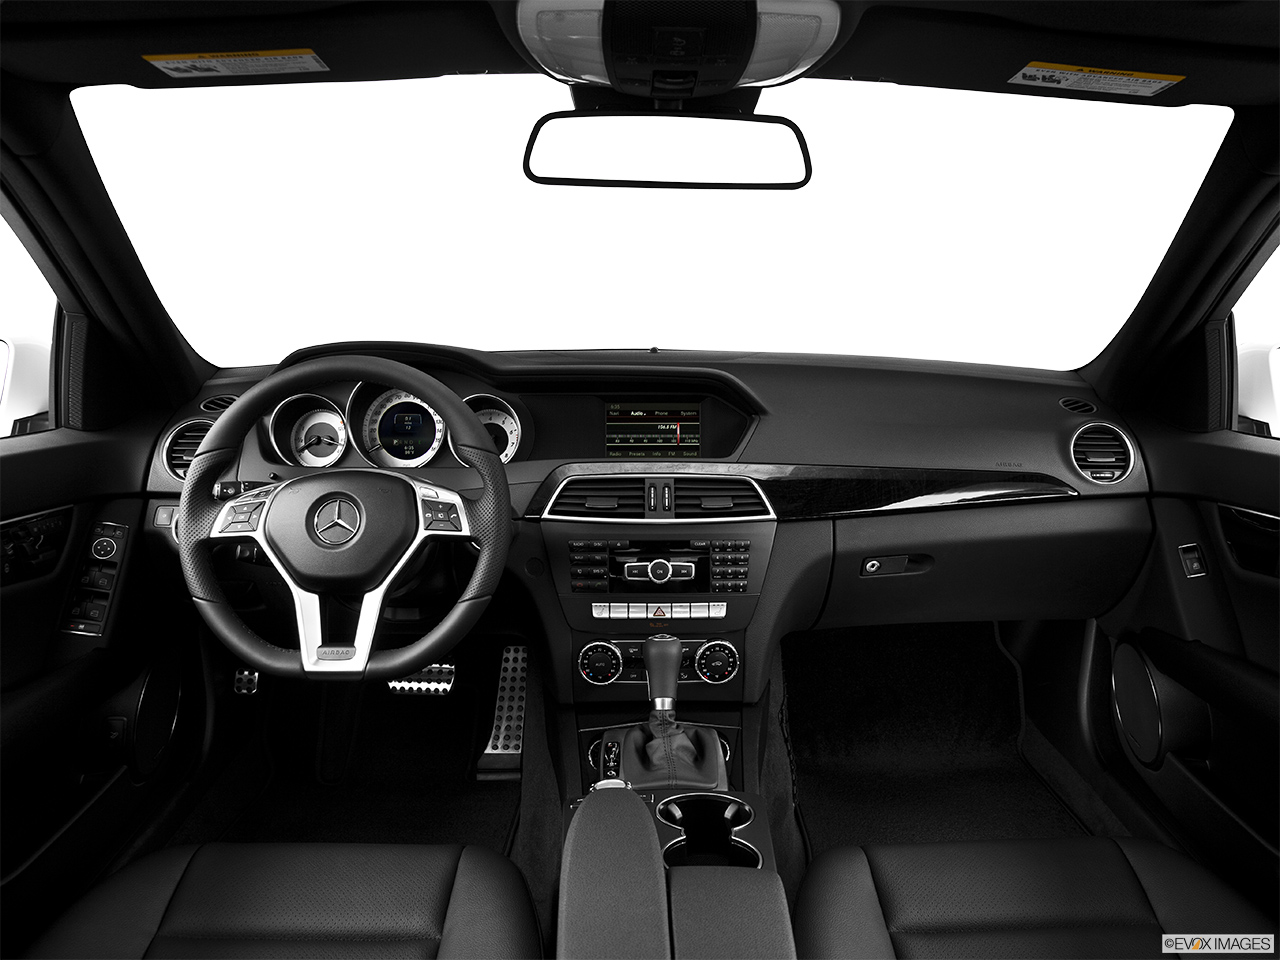 2014 mercedes benz c class sedan c300 luxury 4matic for 2014 mercedes benz c300 4matic